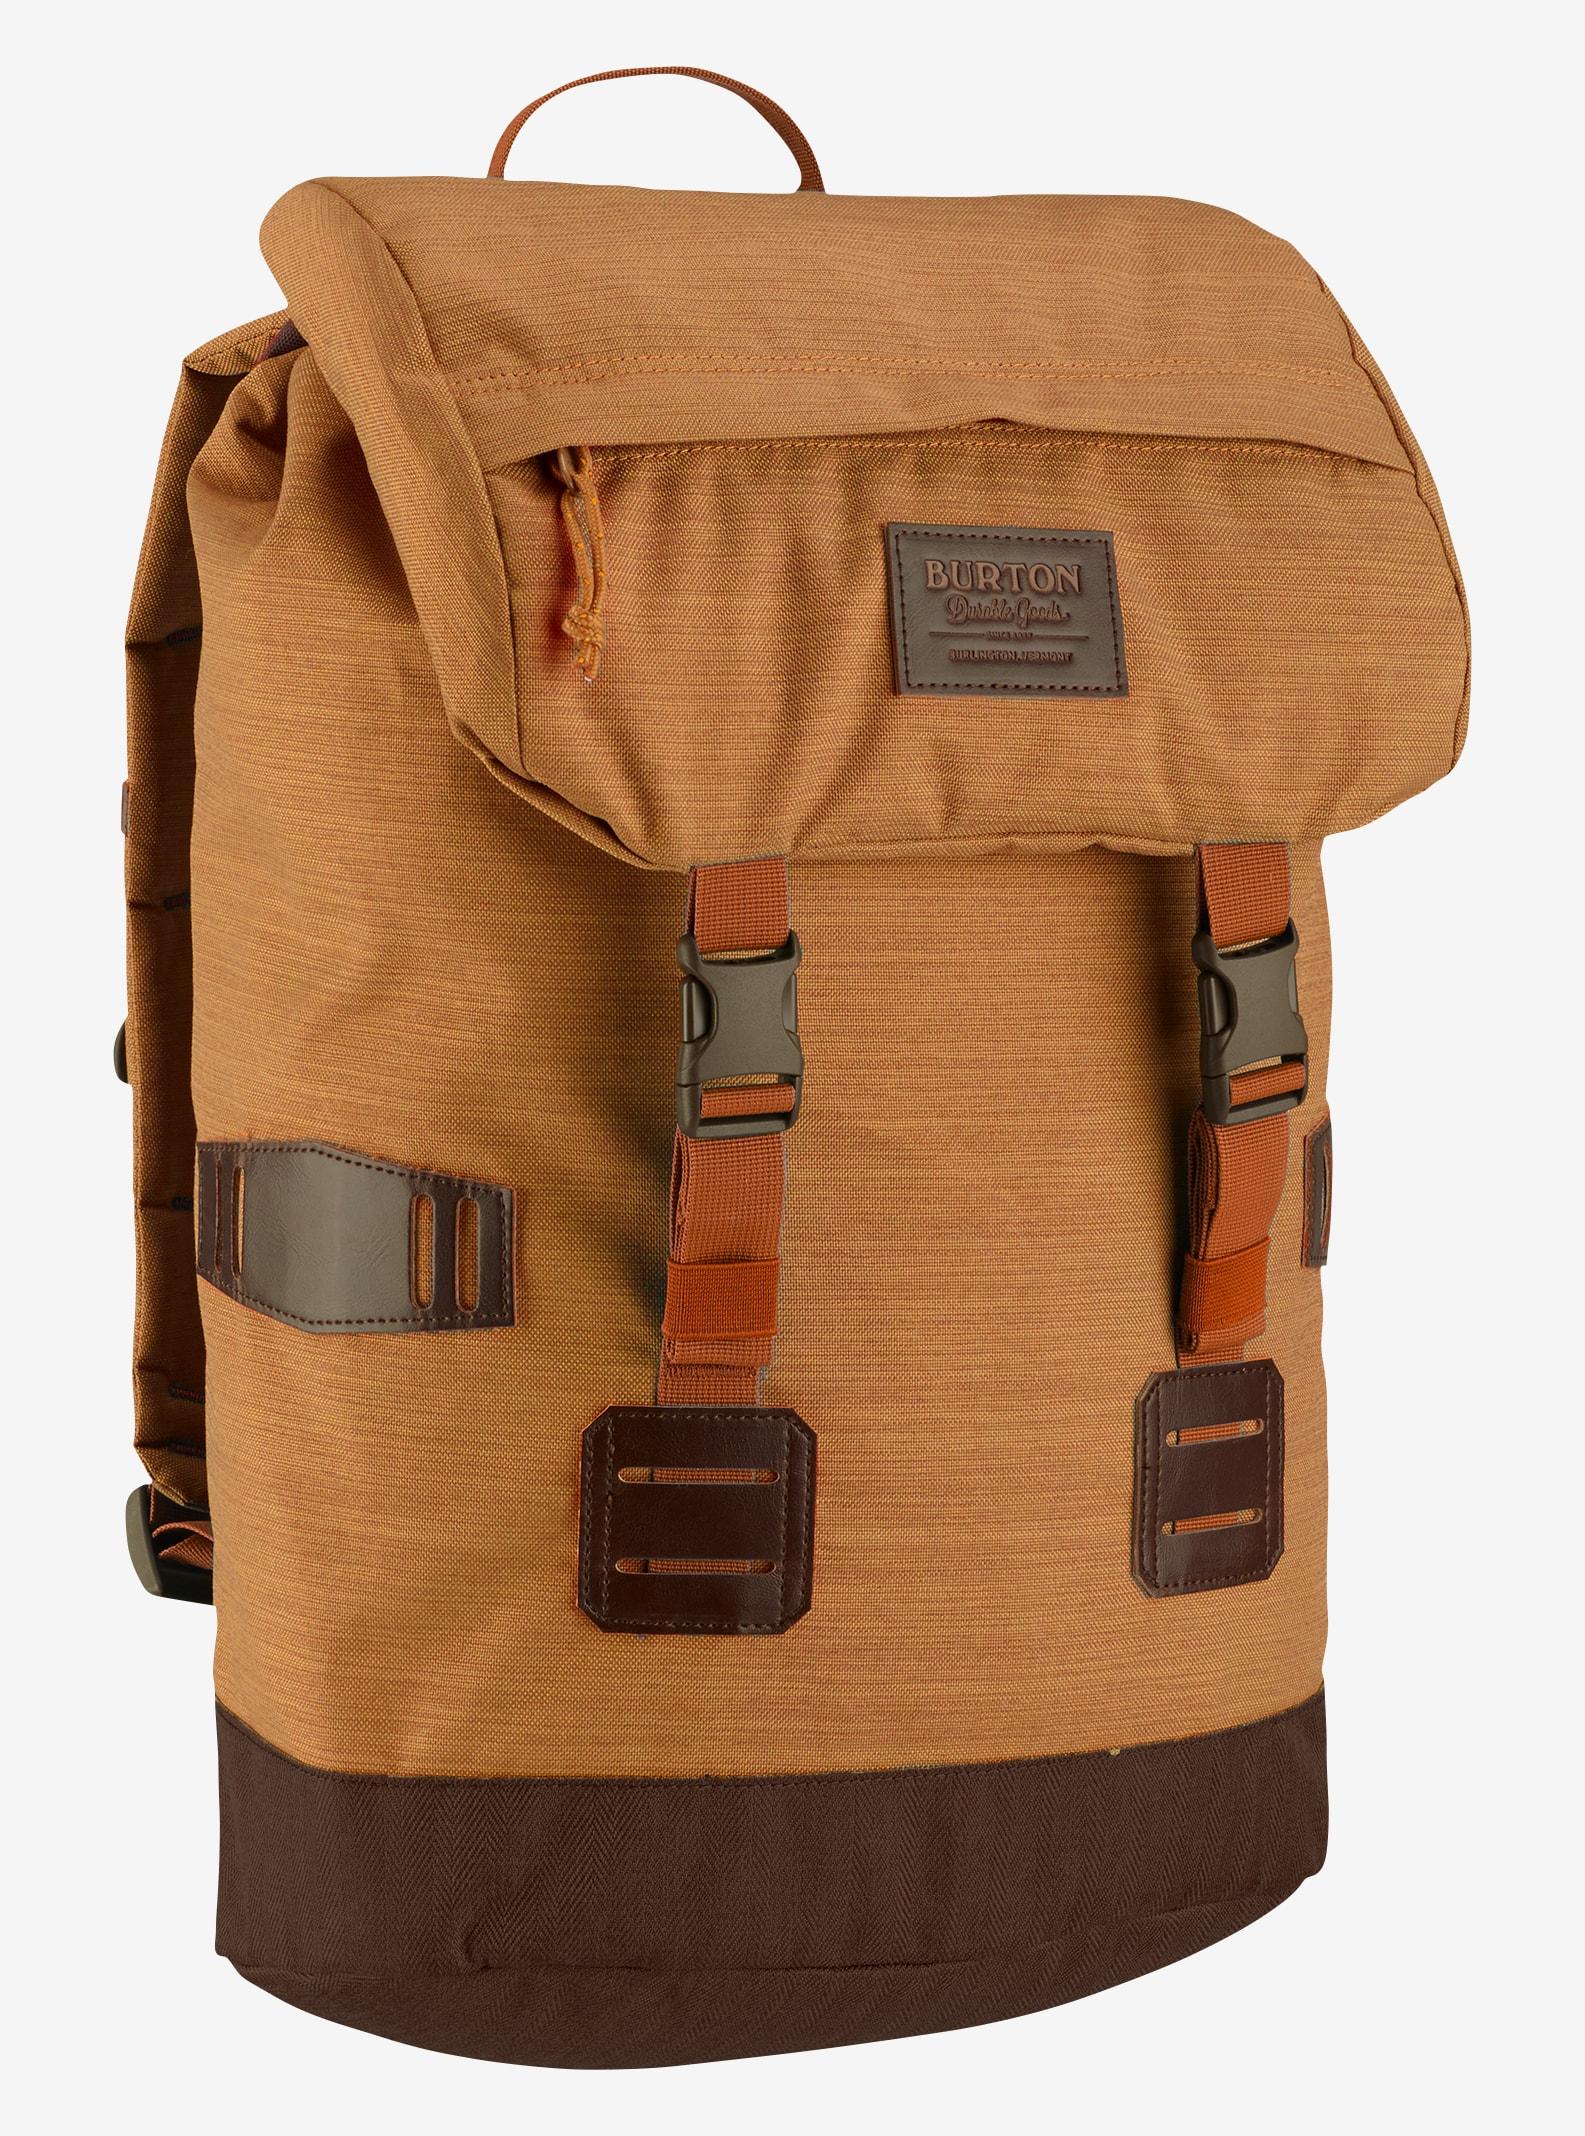 Burton Tinder Backpack shown in Golden Oak Slub